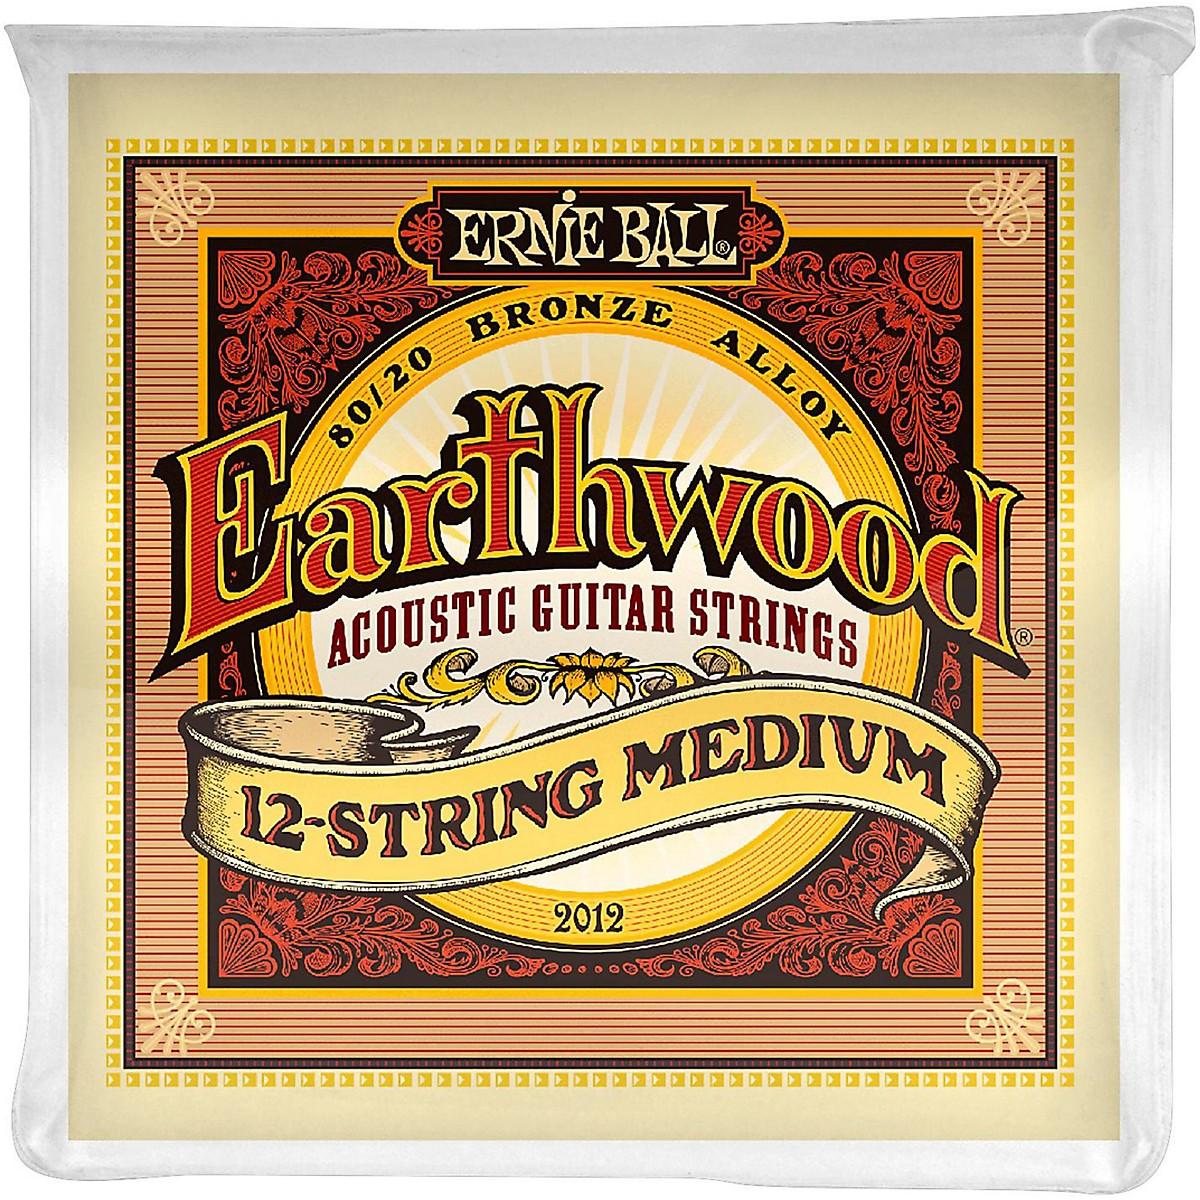 Ernie Ball 2012 Earthwood 80/20 Bronze 12-String Medium Acoustic Guitar Strings